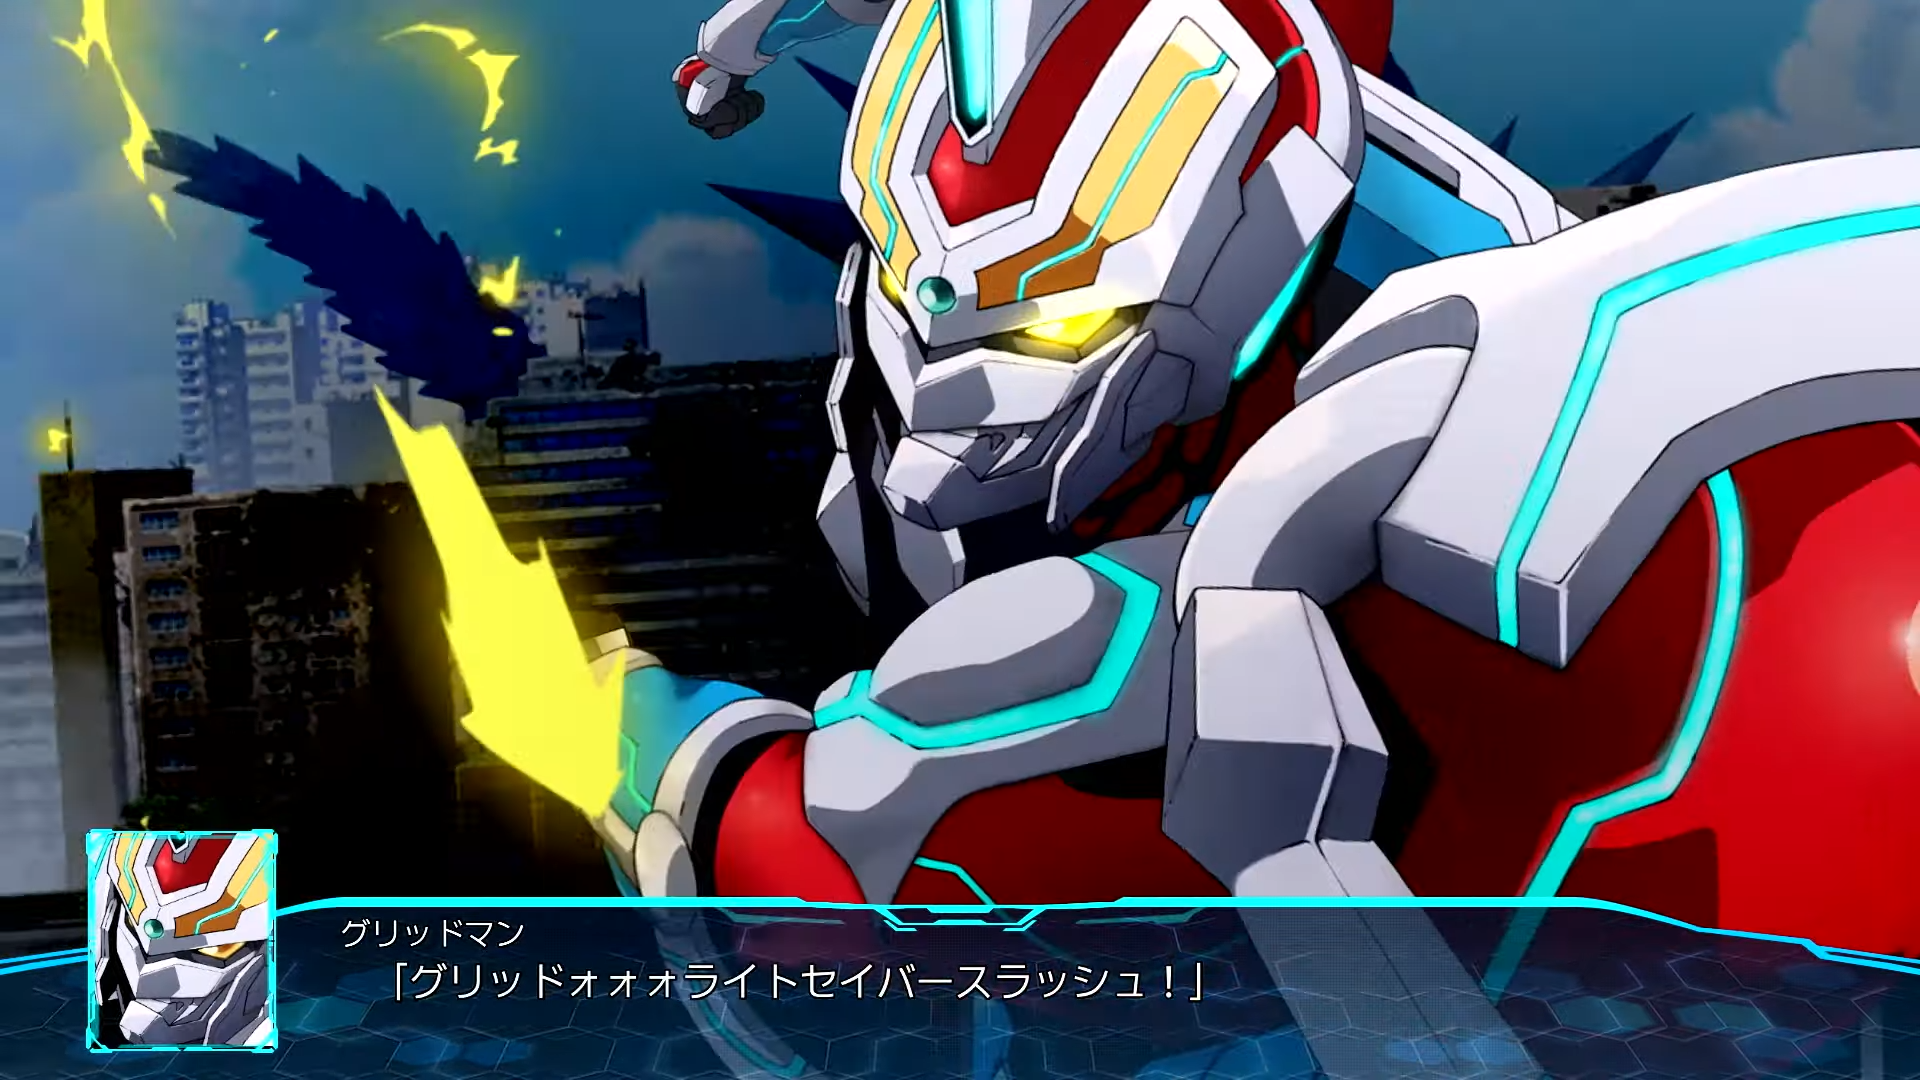 SSSS.GRIDMAN in Super Robot Wars 30